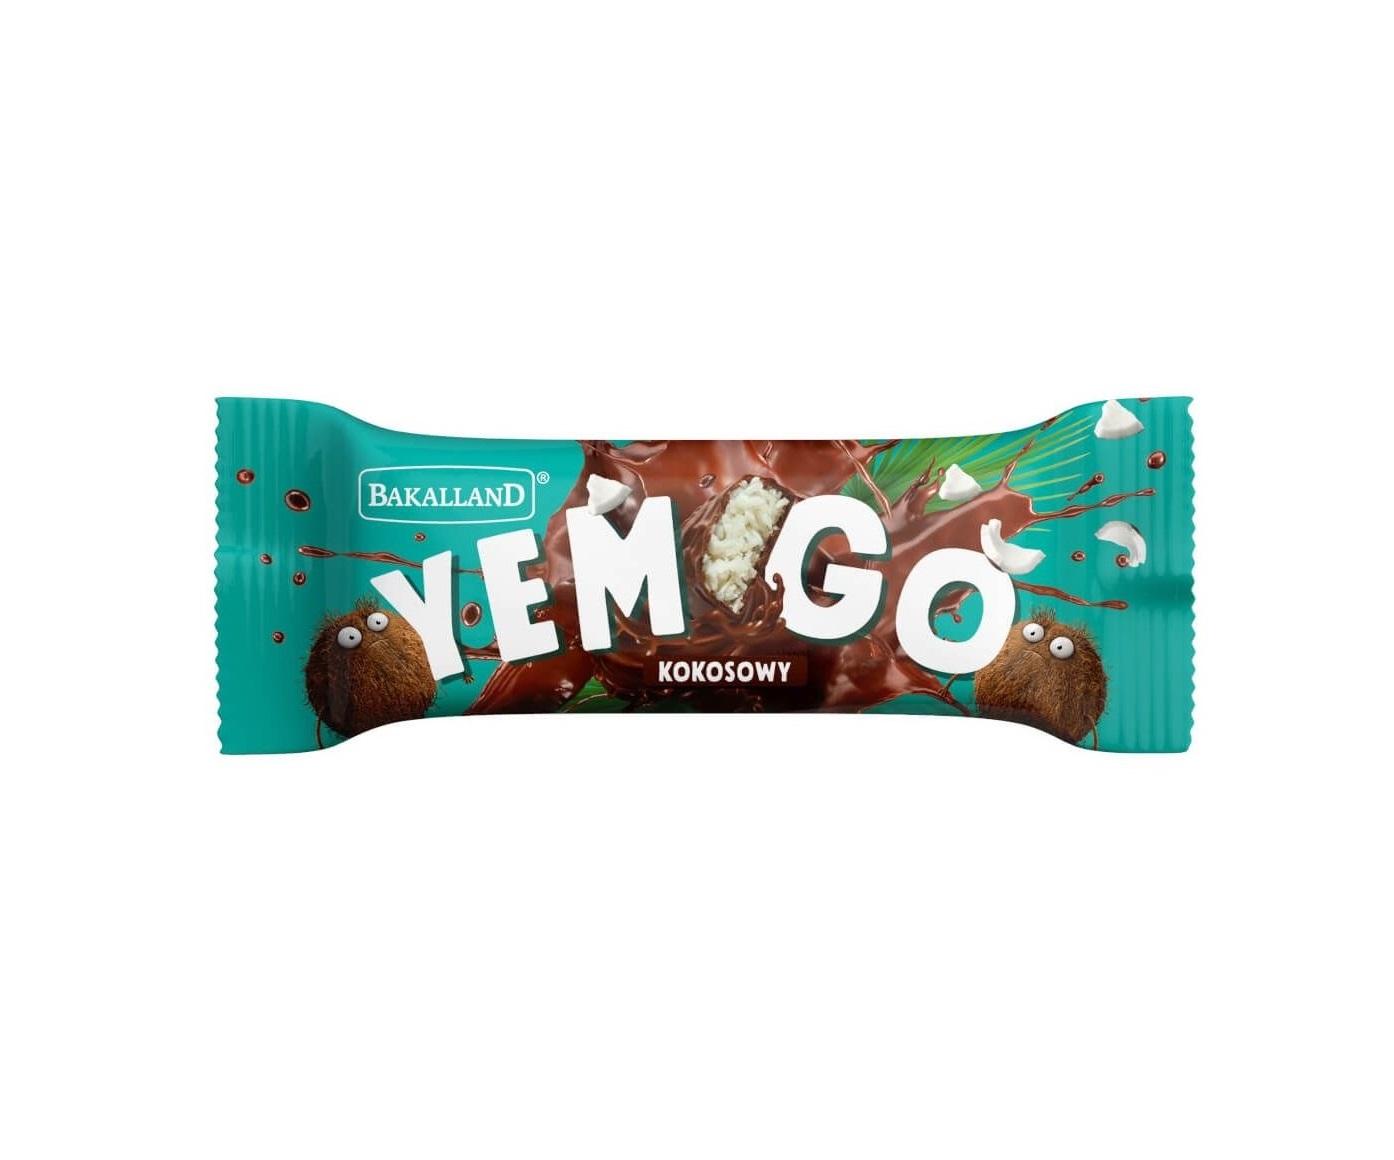 bak-yemgo-kokos